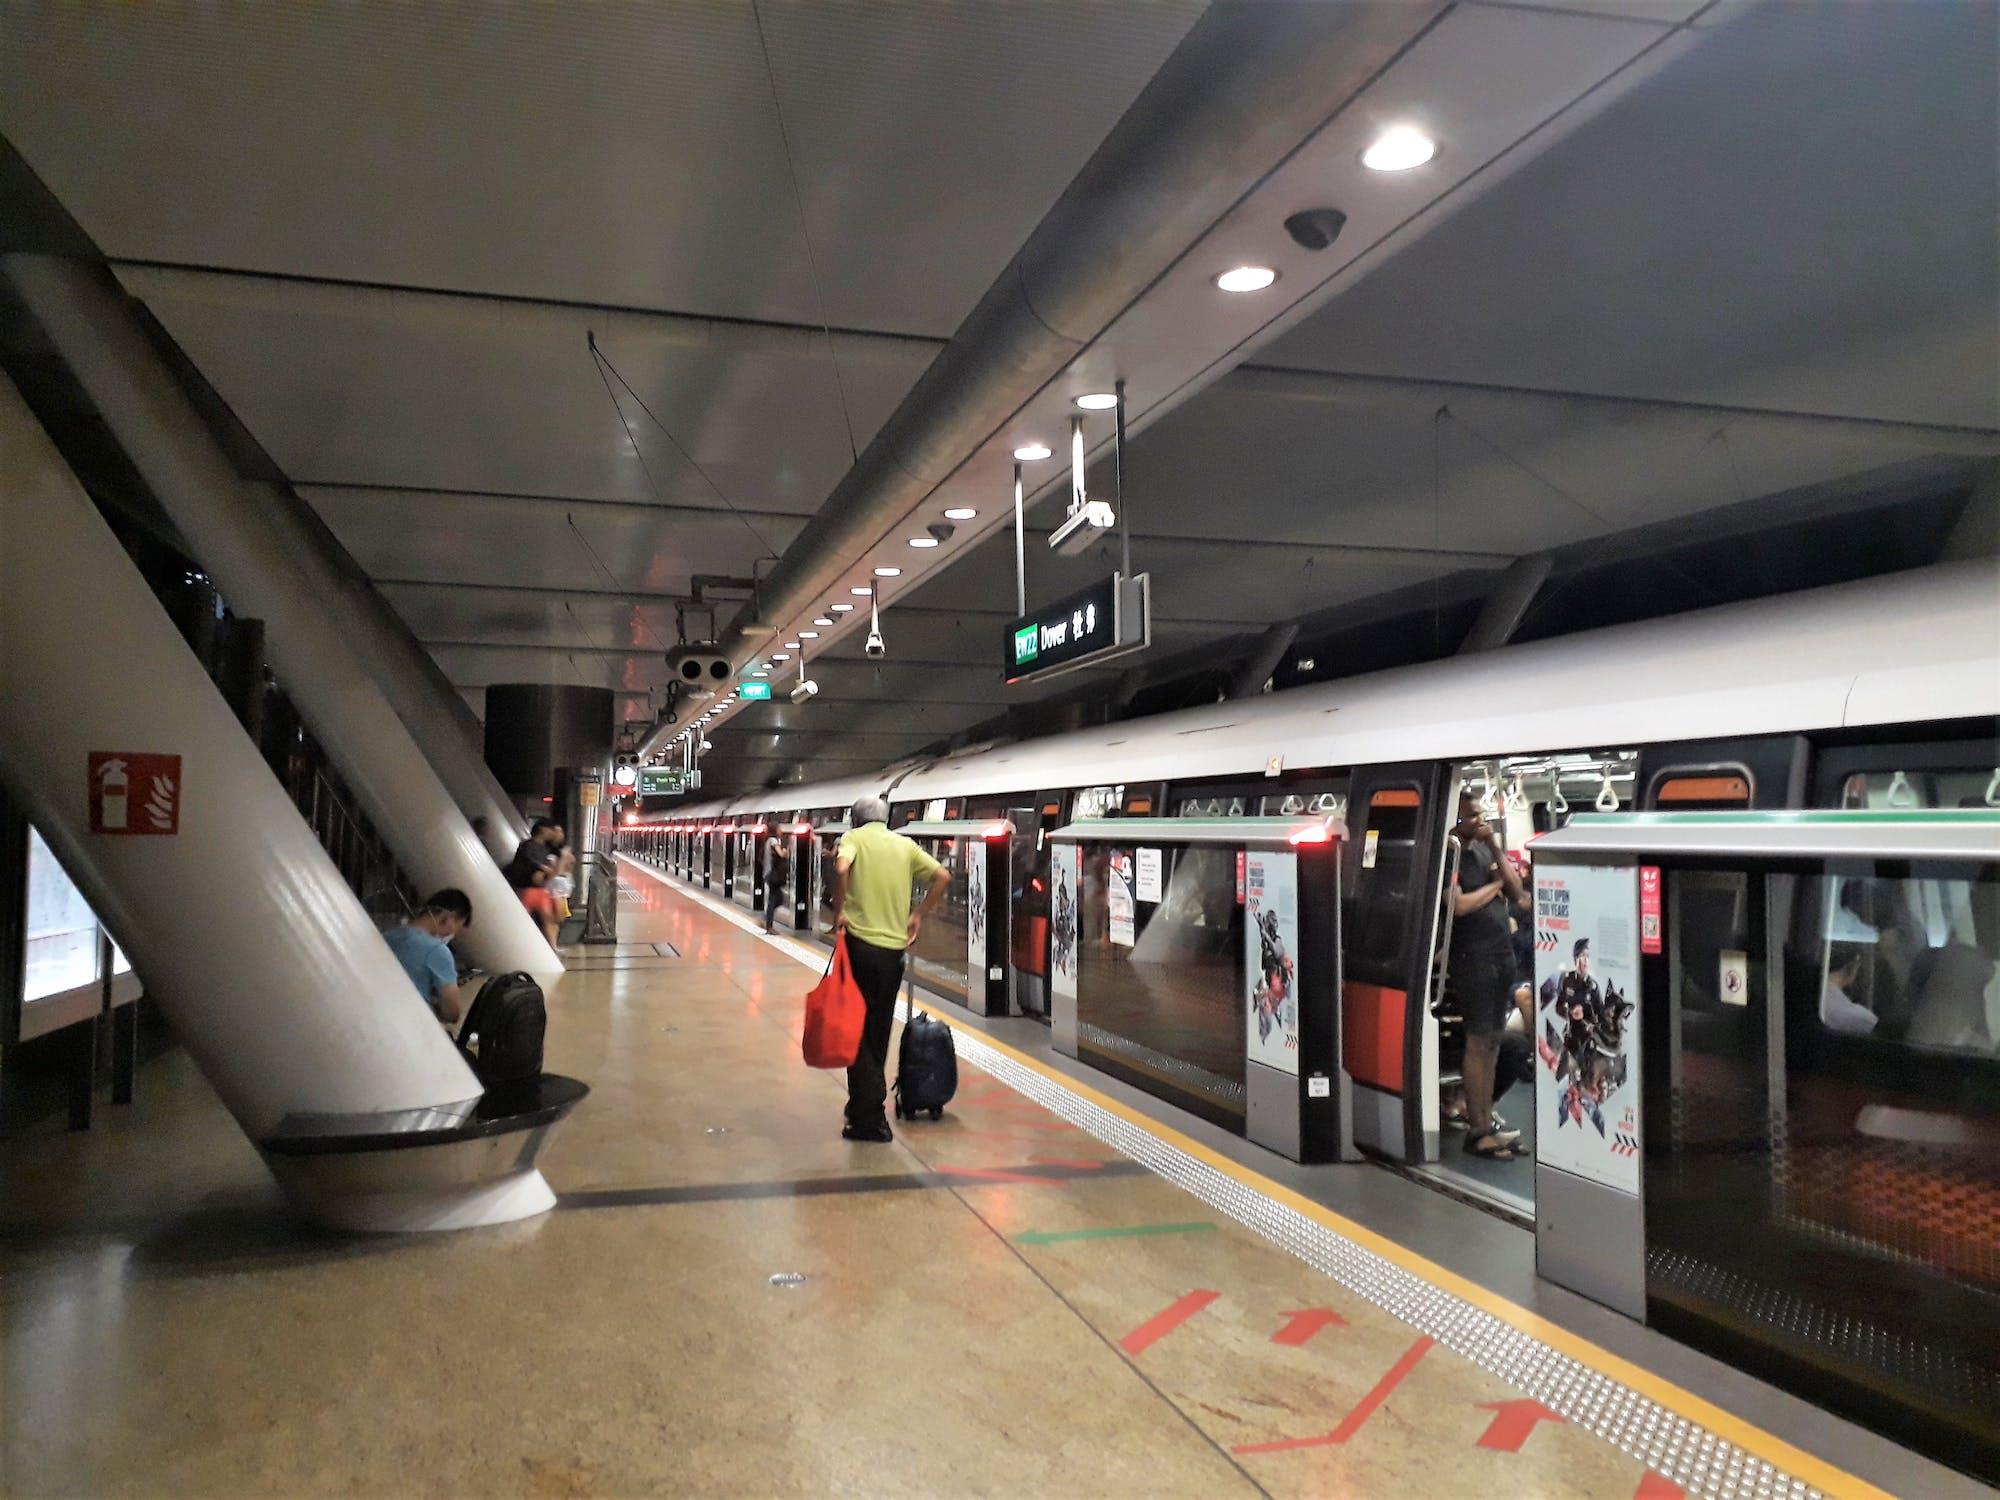 Dover MRT Station platform